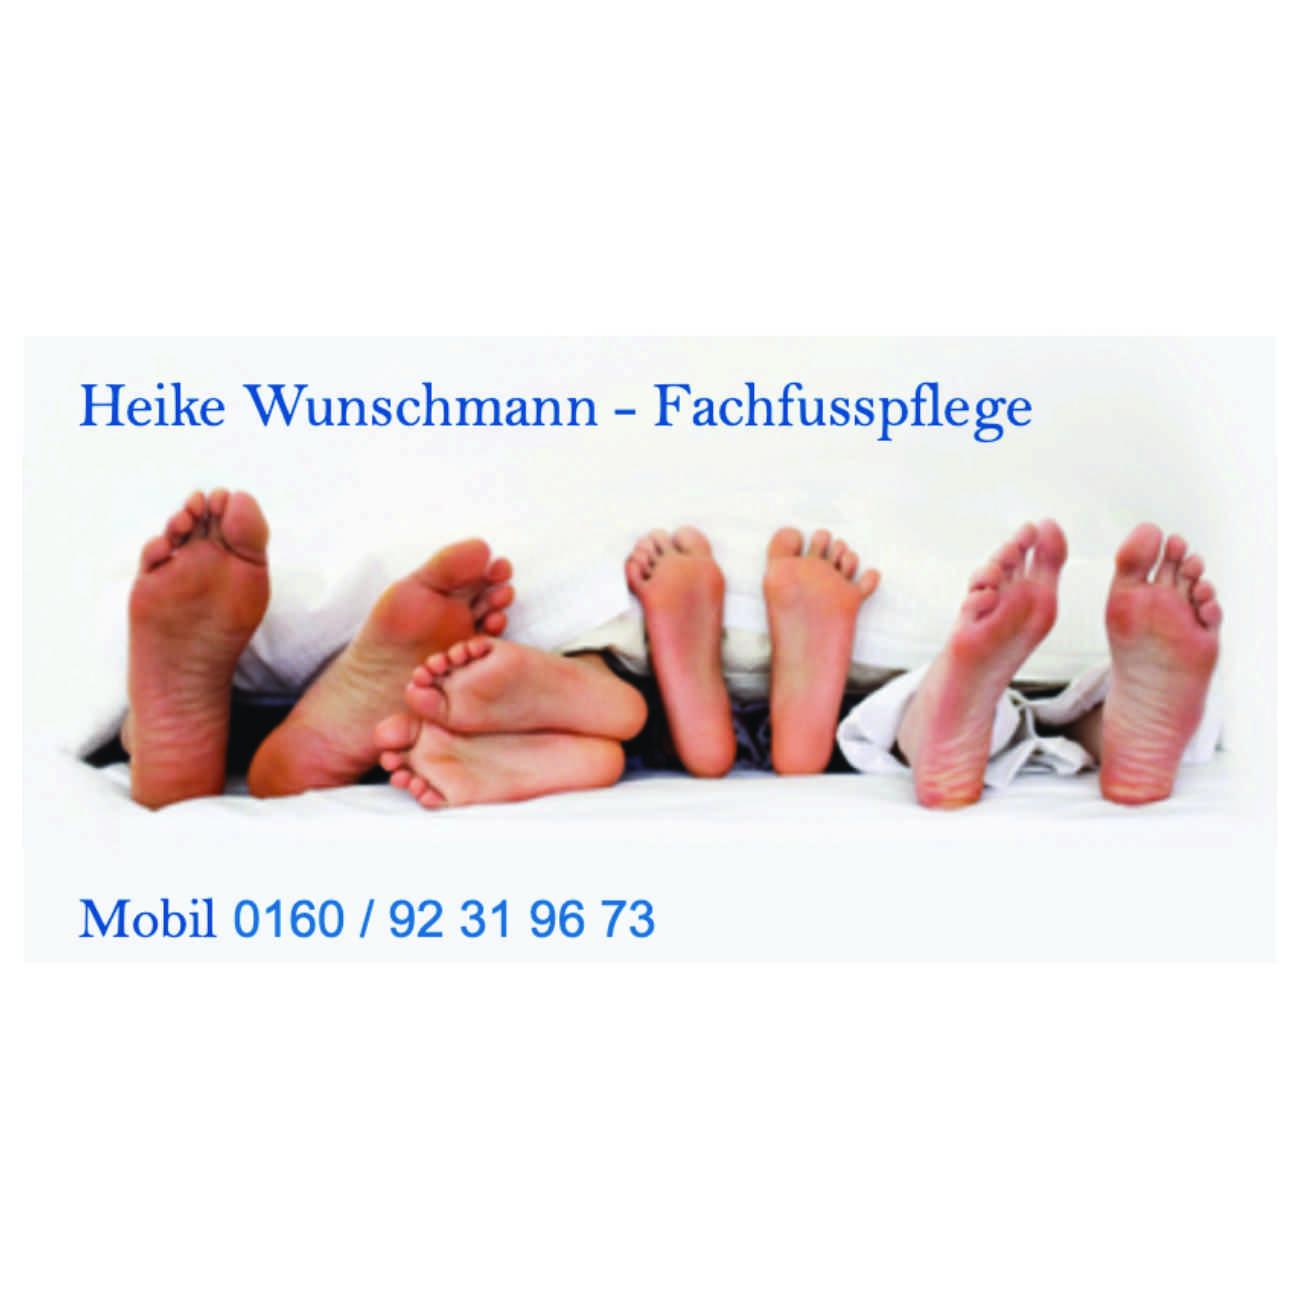 Fusspflege Heike Wunschmann